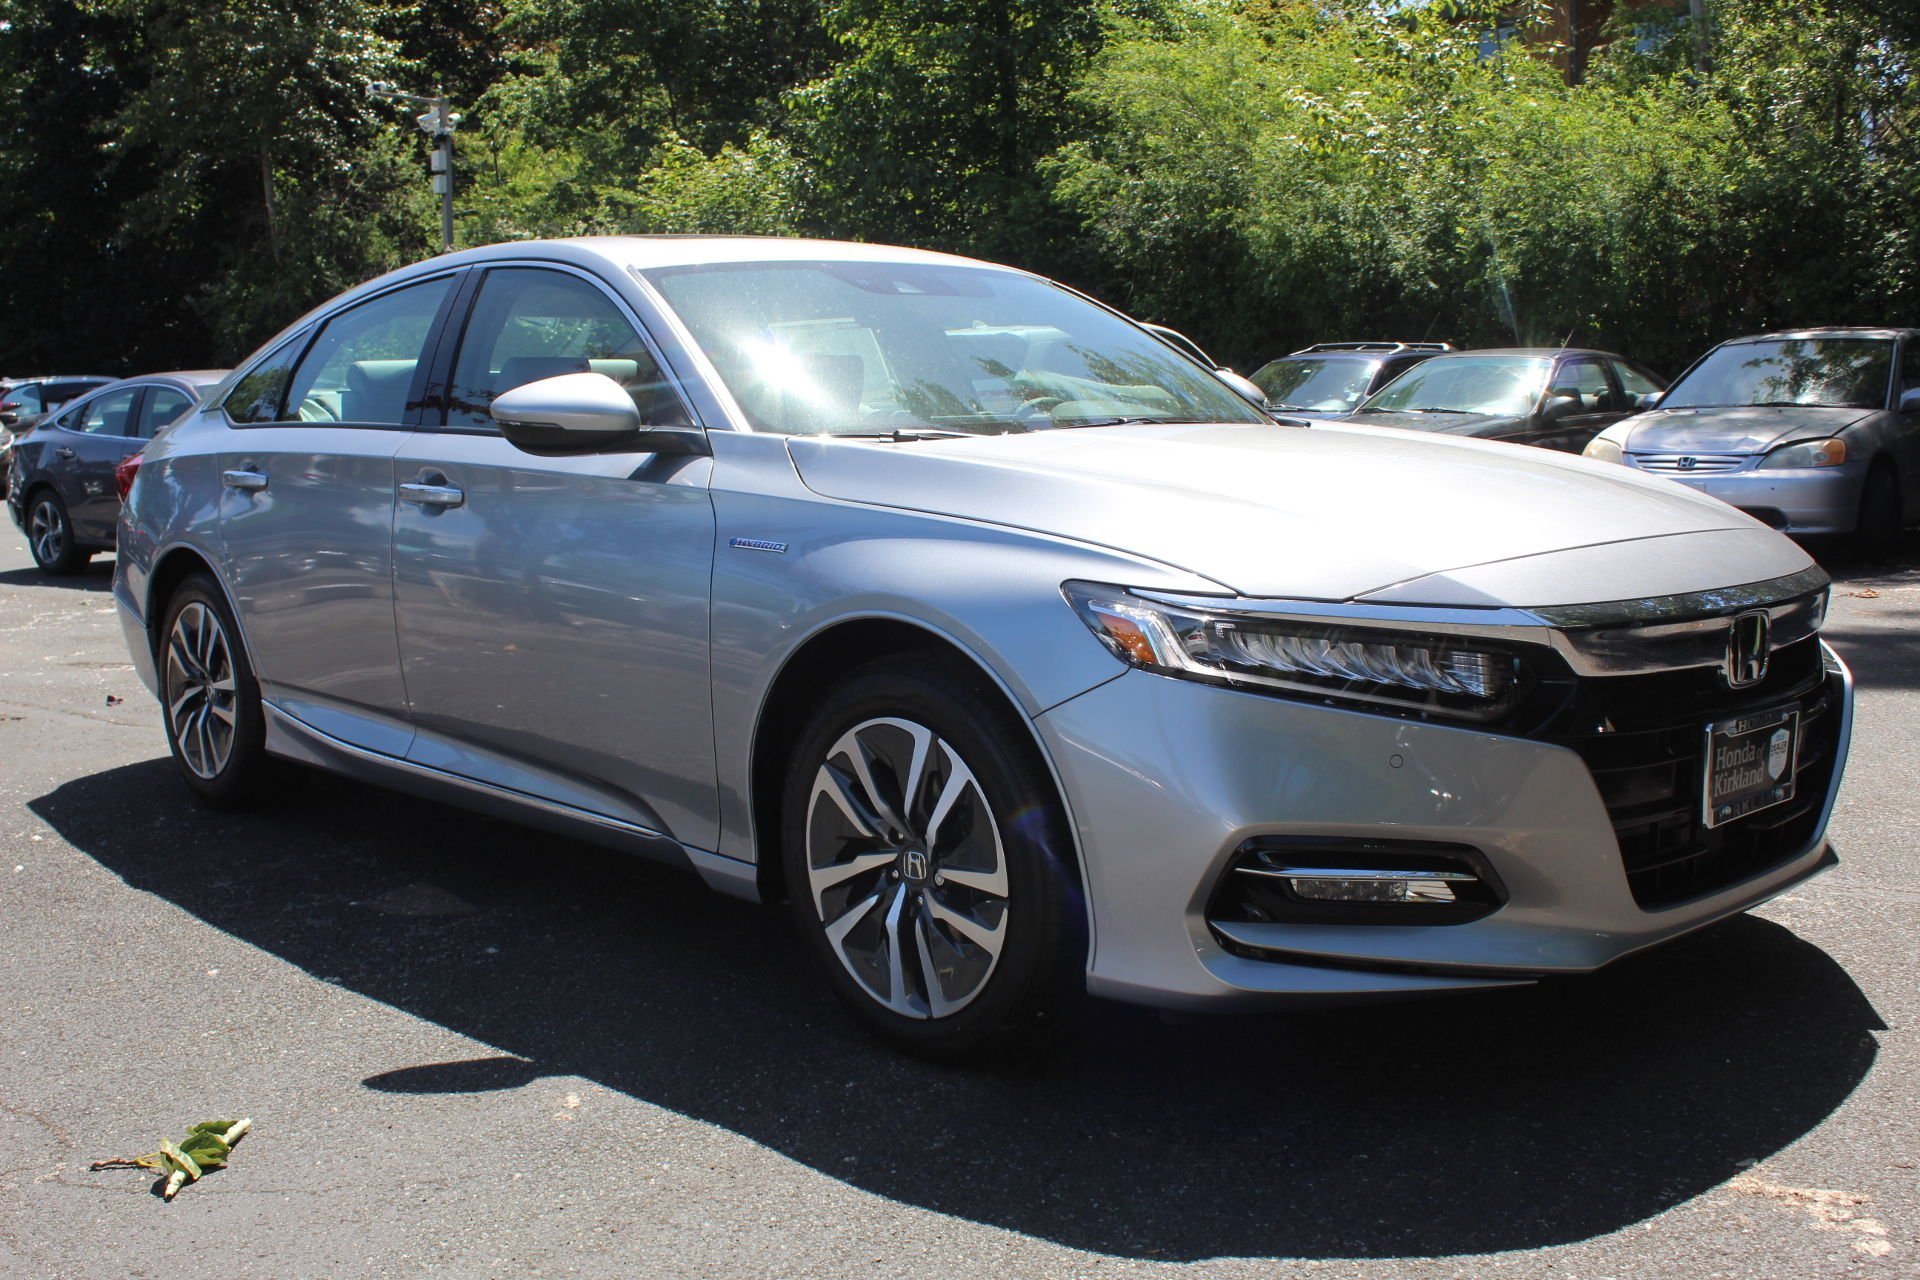 New 2019 Honda Accord Hybrid EX-L Sedan 2.0T EX-L Sedan for sale $31,720 at M and V Leasing in Brooklyn NY 11223 1